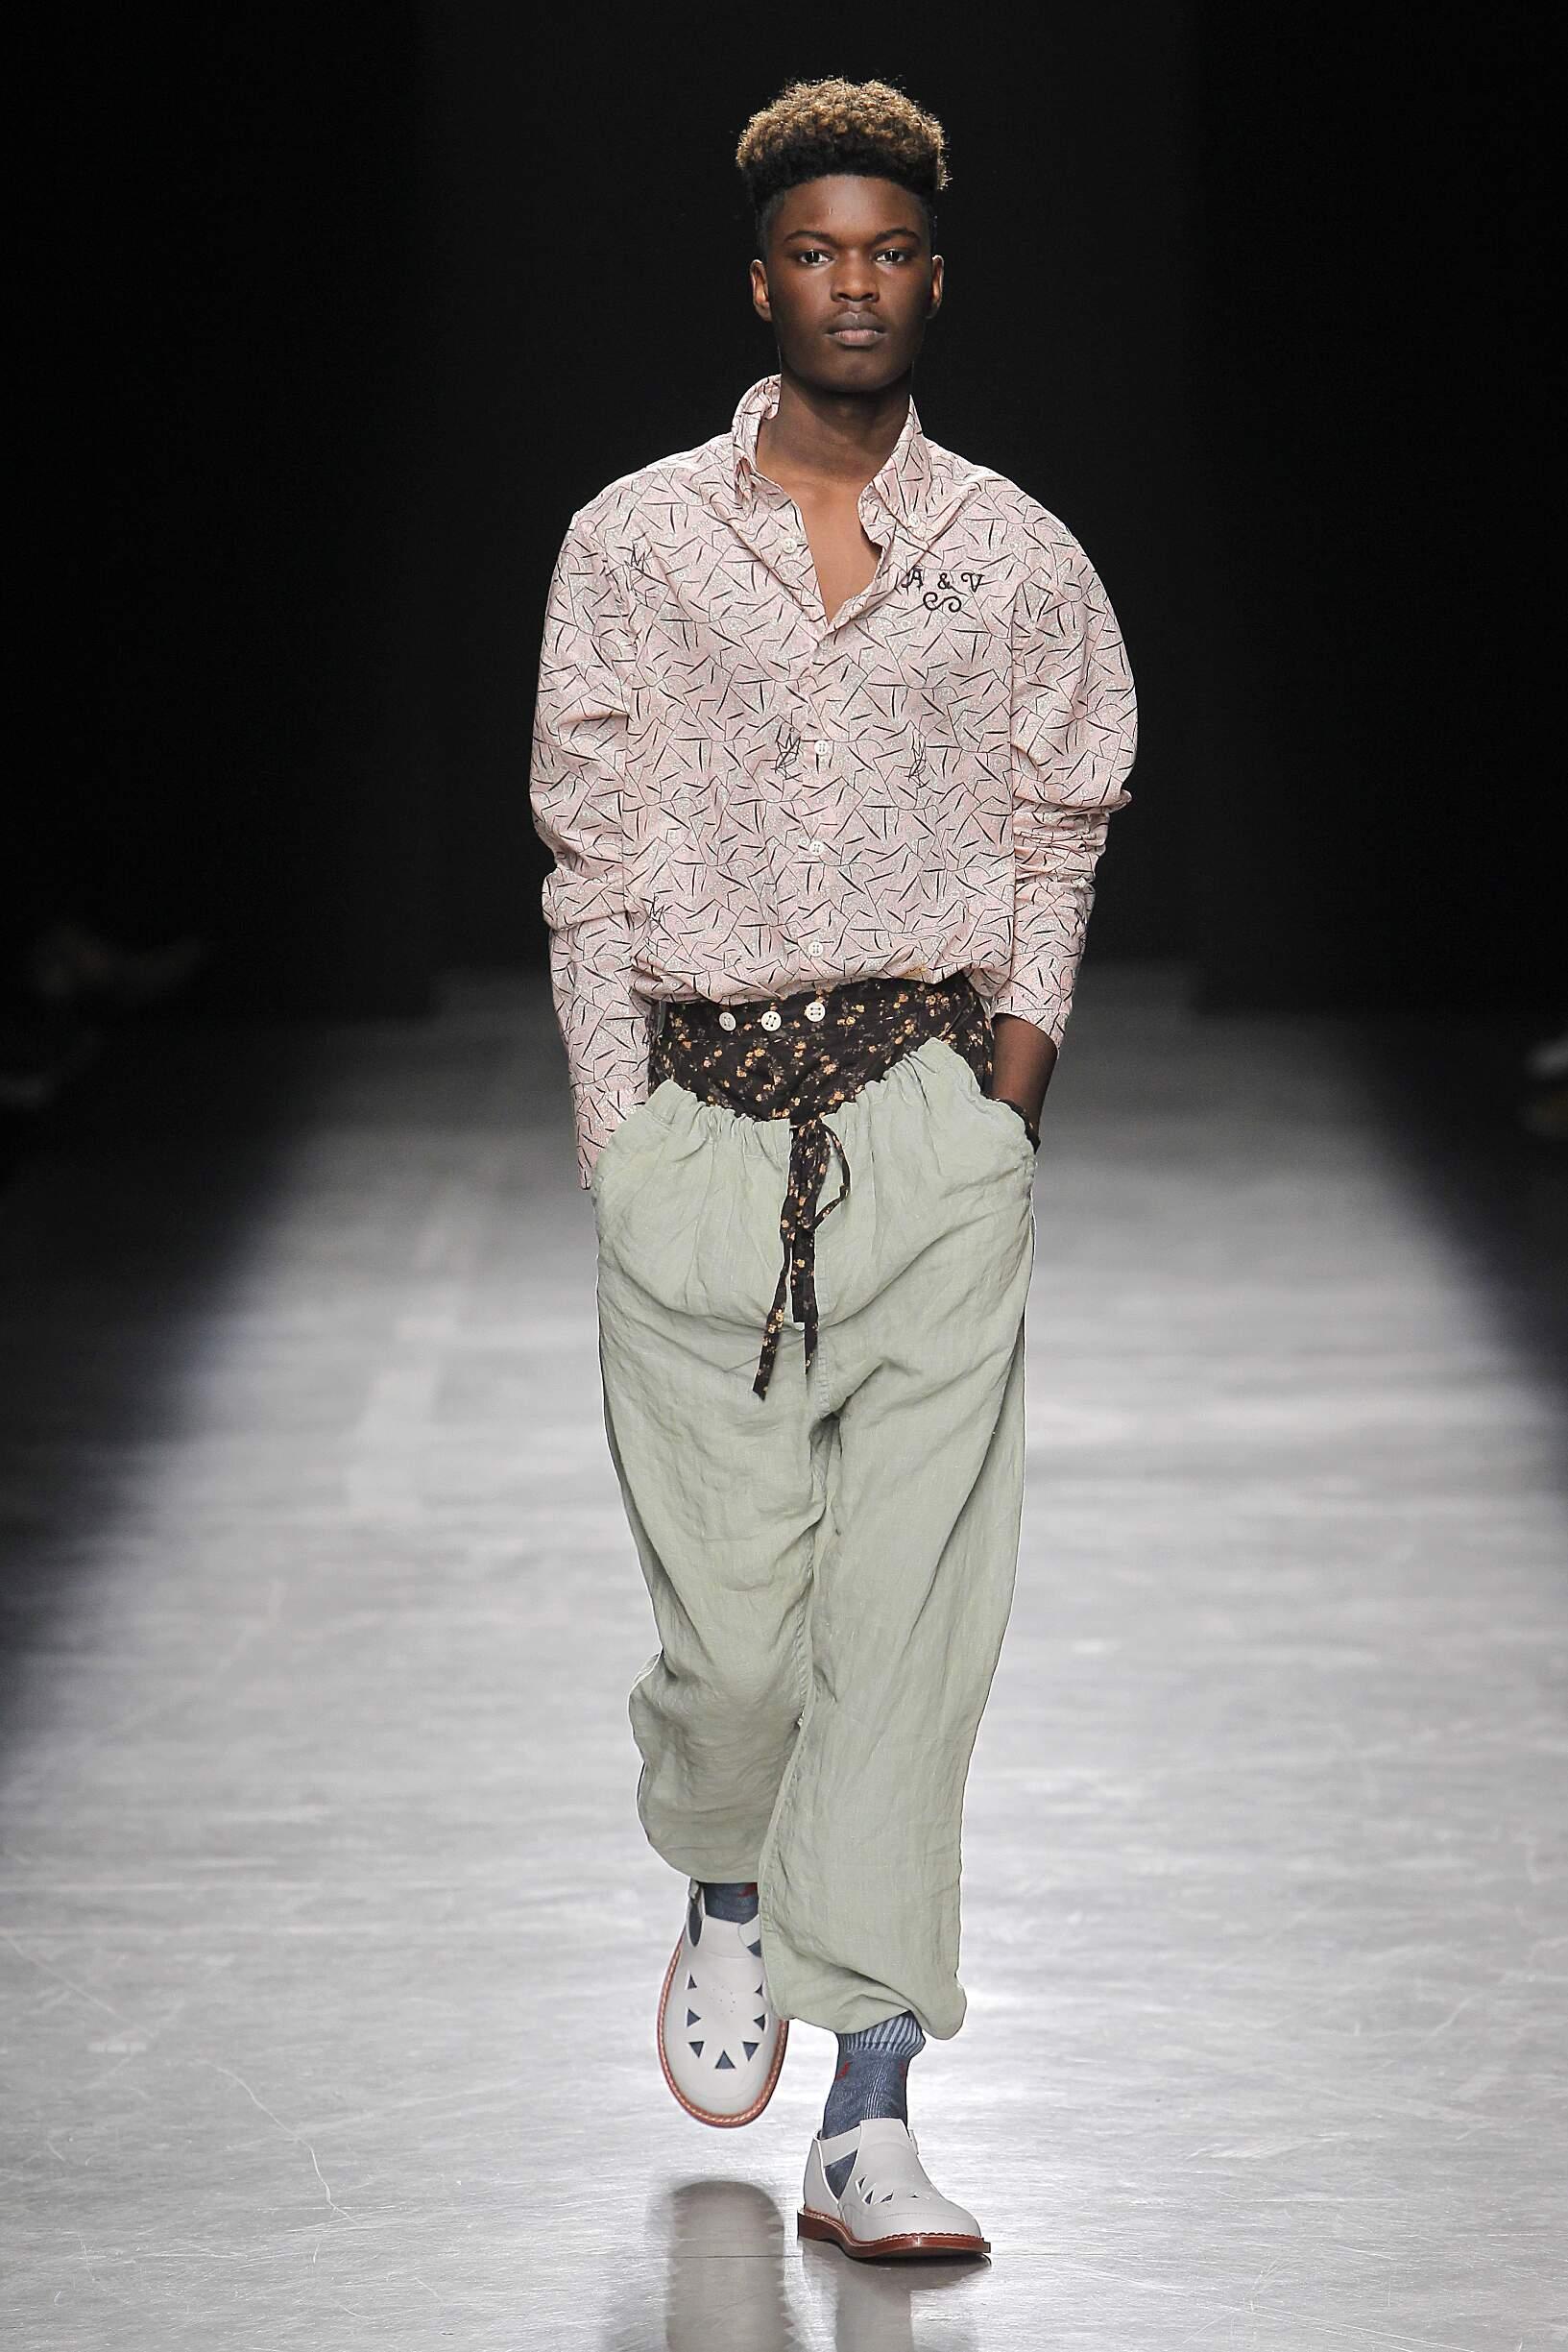 Andreas Kronthaler for Vivienne Westwood 2017 Menswear